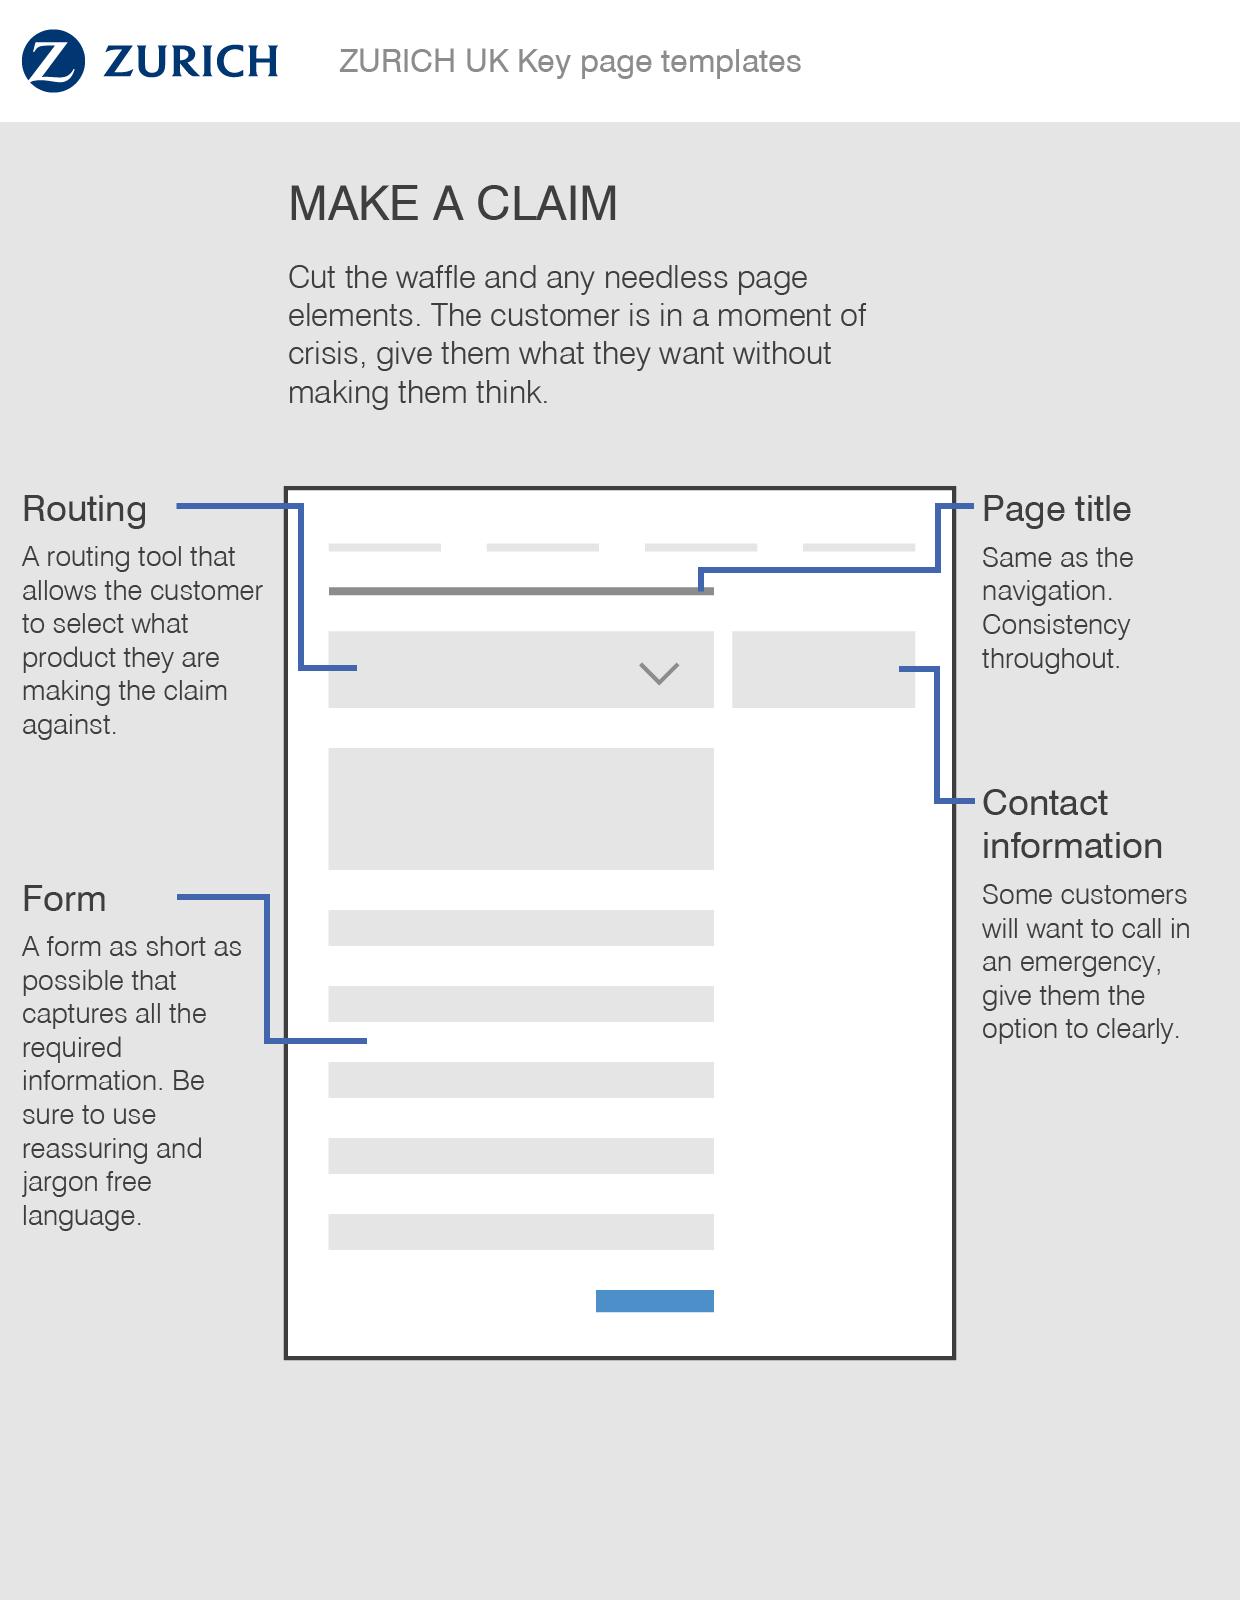 Make a claim1x.png